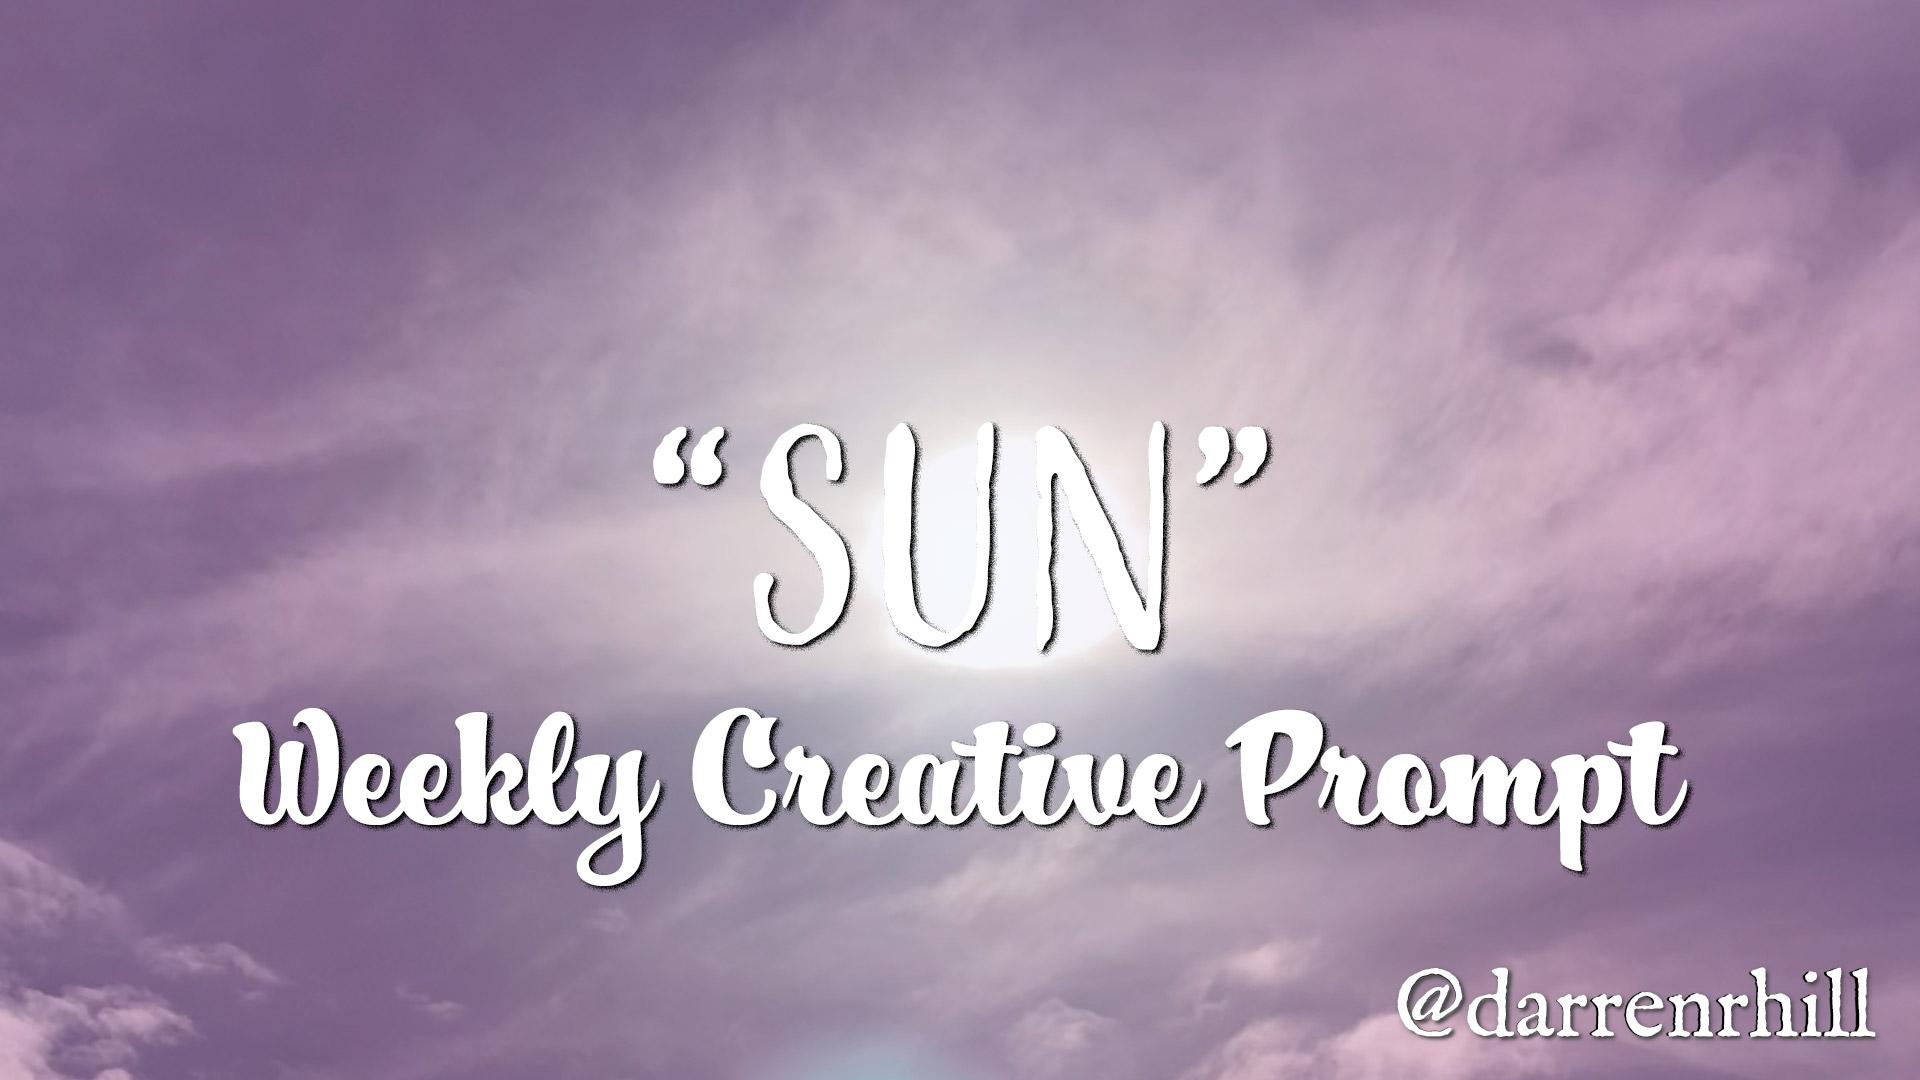 Sun weekly creative prompt